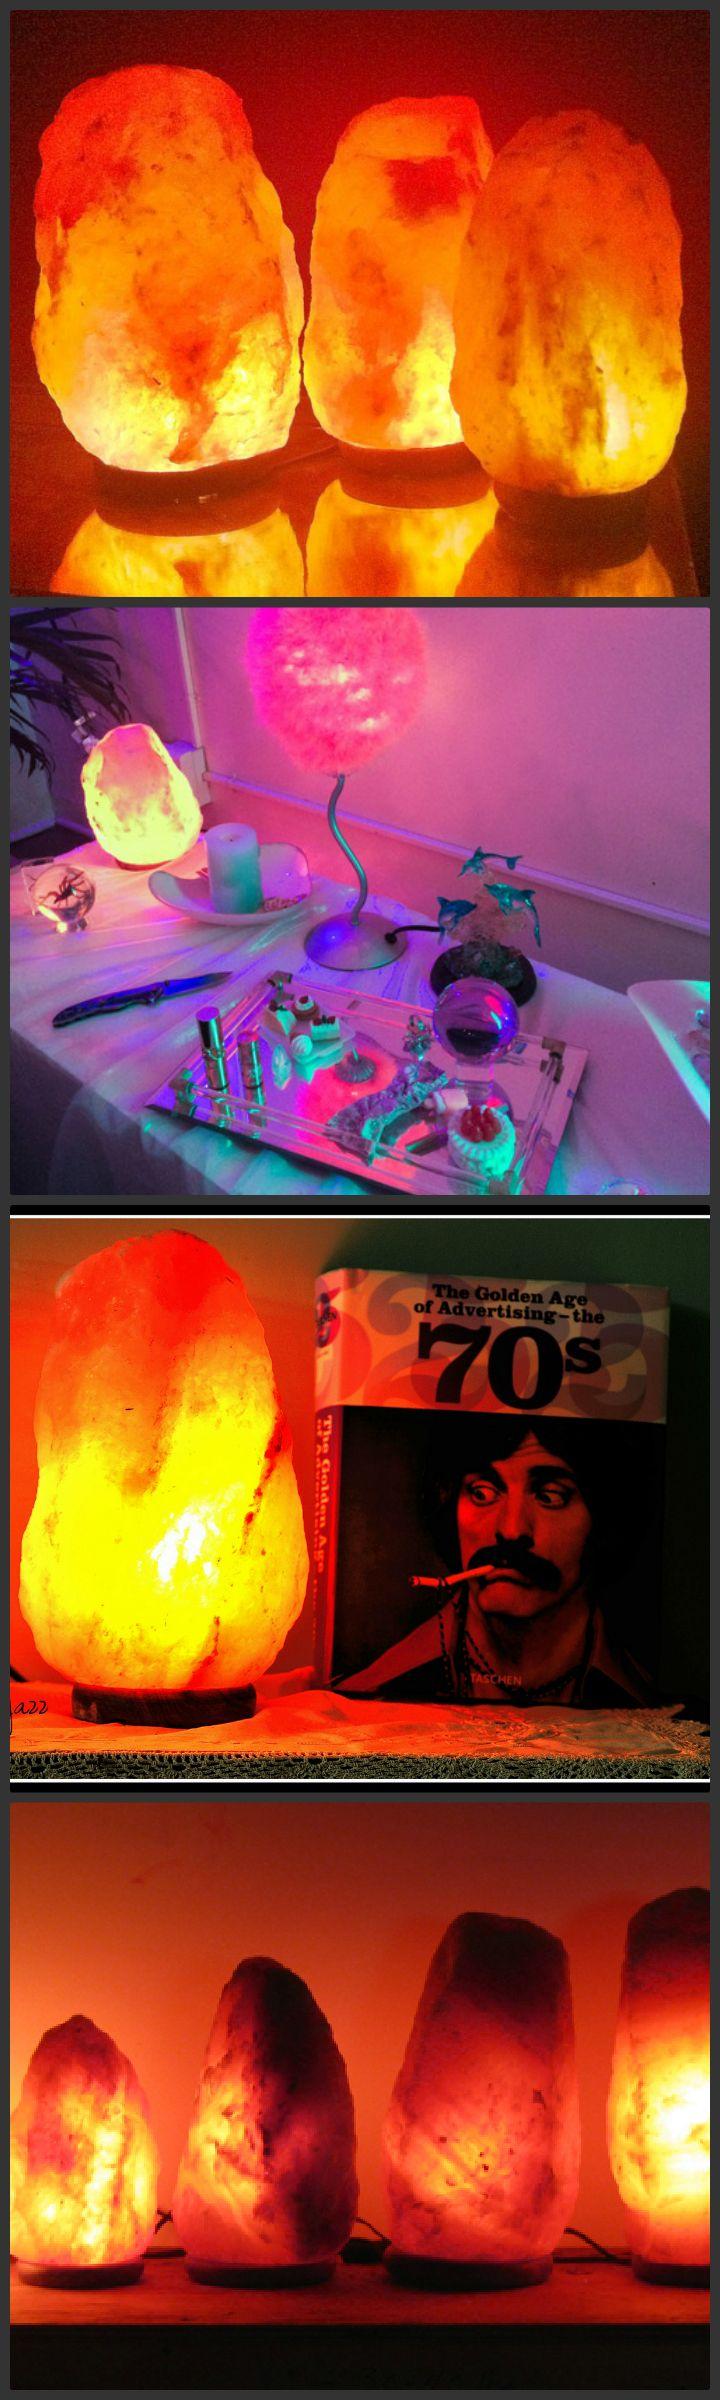 Salt Lamps Emit Negative Ions : Best 25+ Salt rock lamp ideas on Pinterest Rock salt benefits, Himalayan rock salt lamp and ...